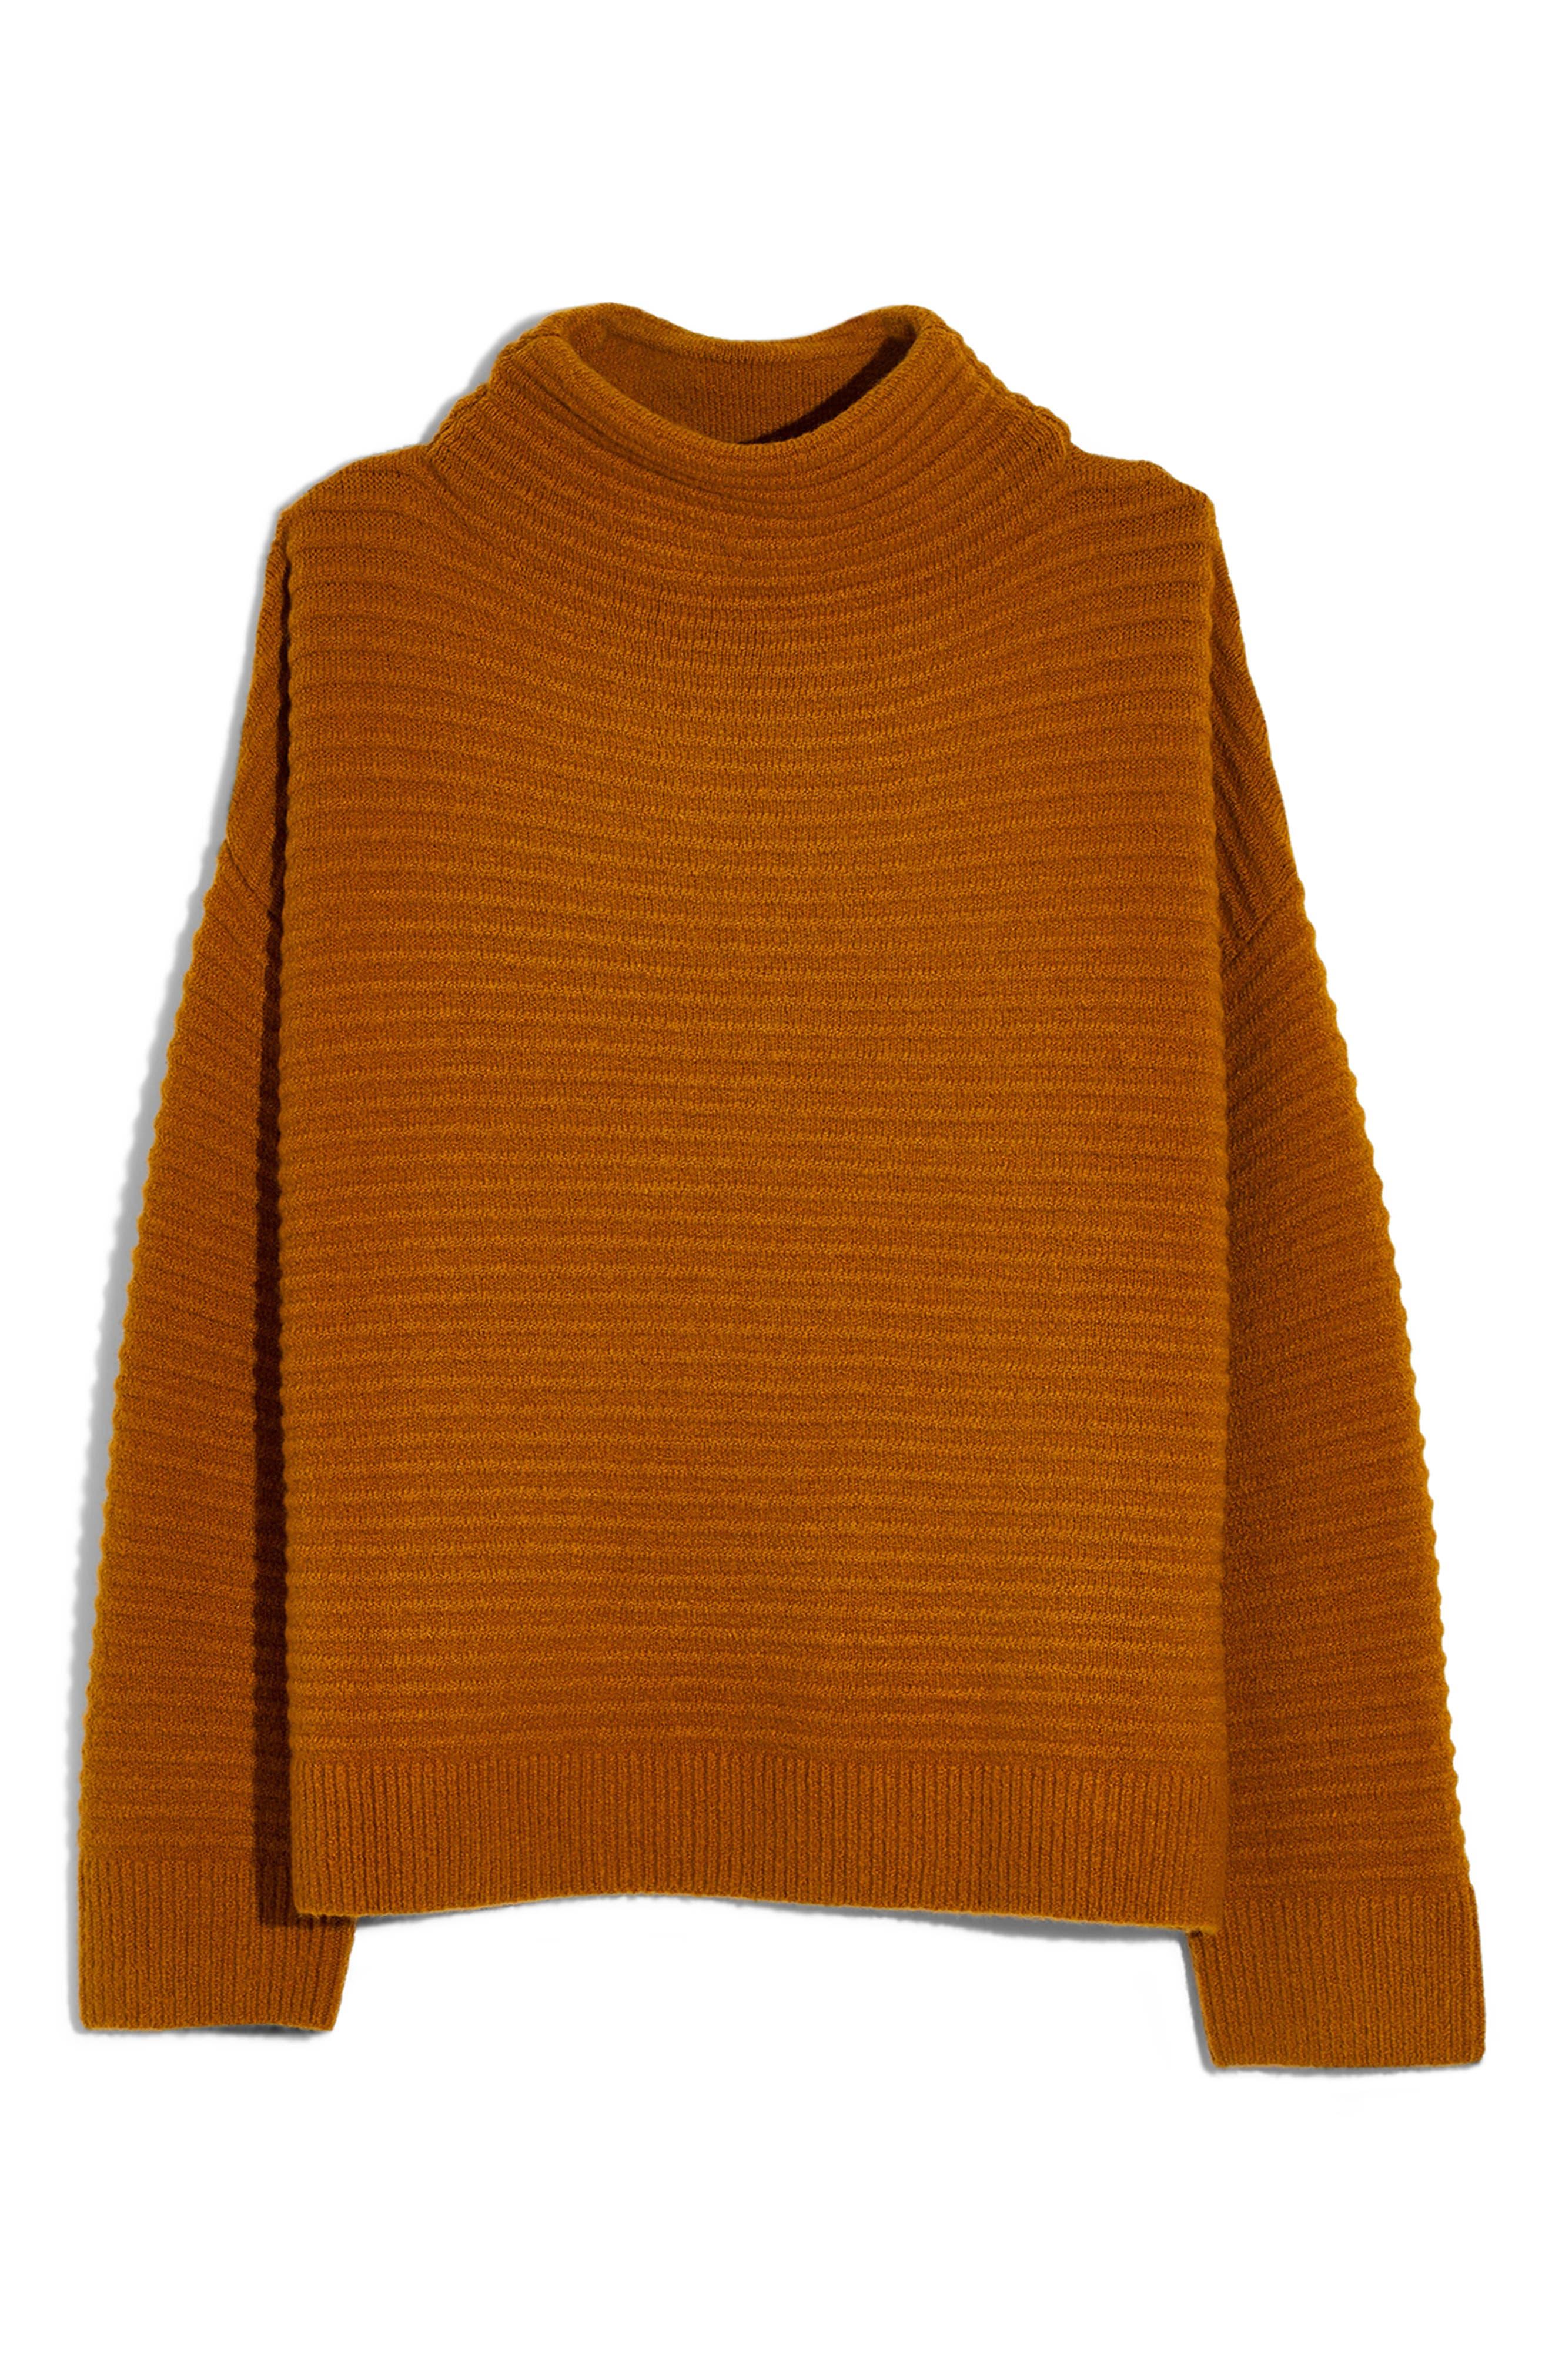 Belmont Mock Neck Sweater,                             Alternate thumbnail 6, color,                             GOLDEN HARVEST